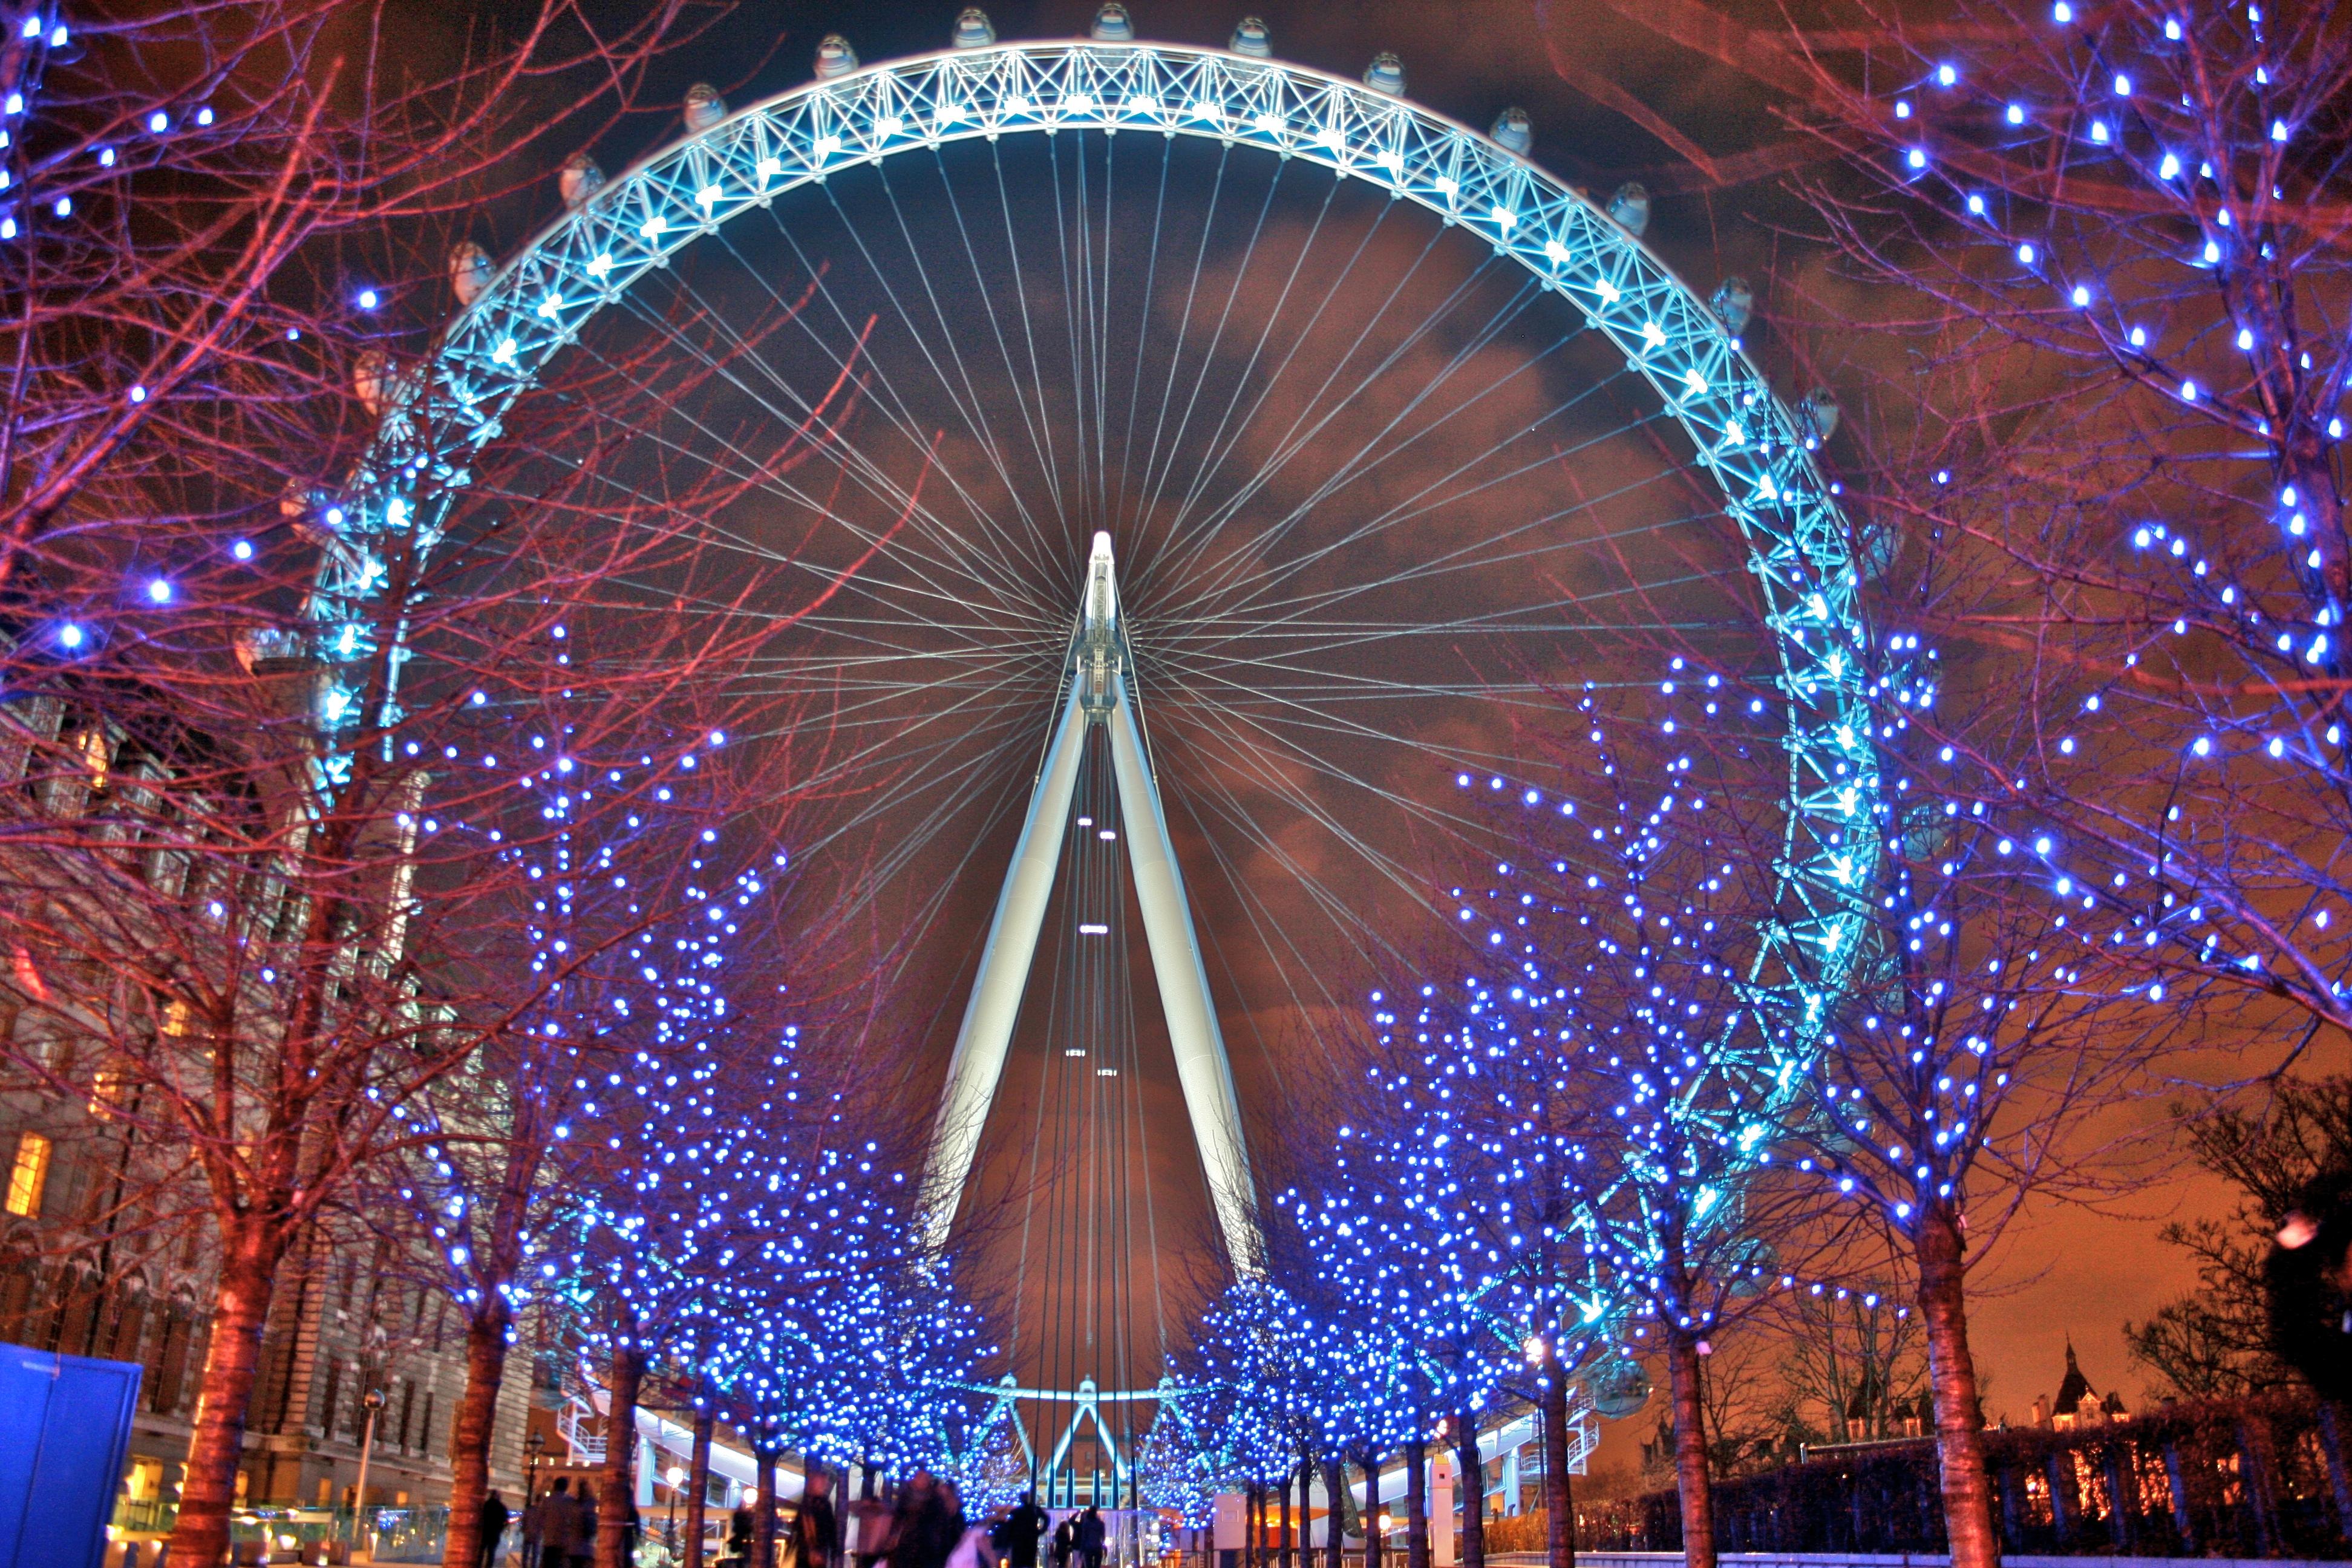 london eye by night - photo #35